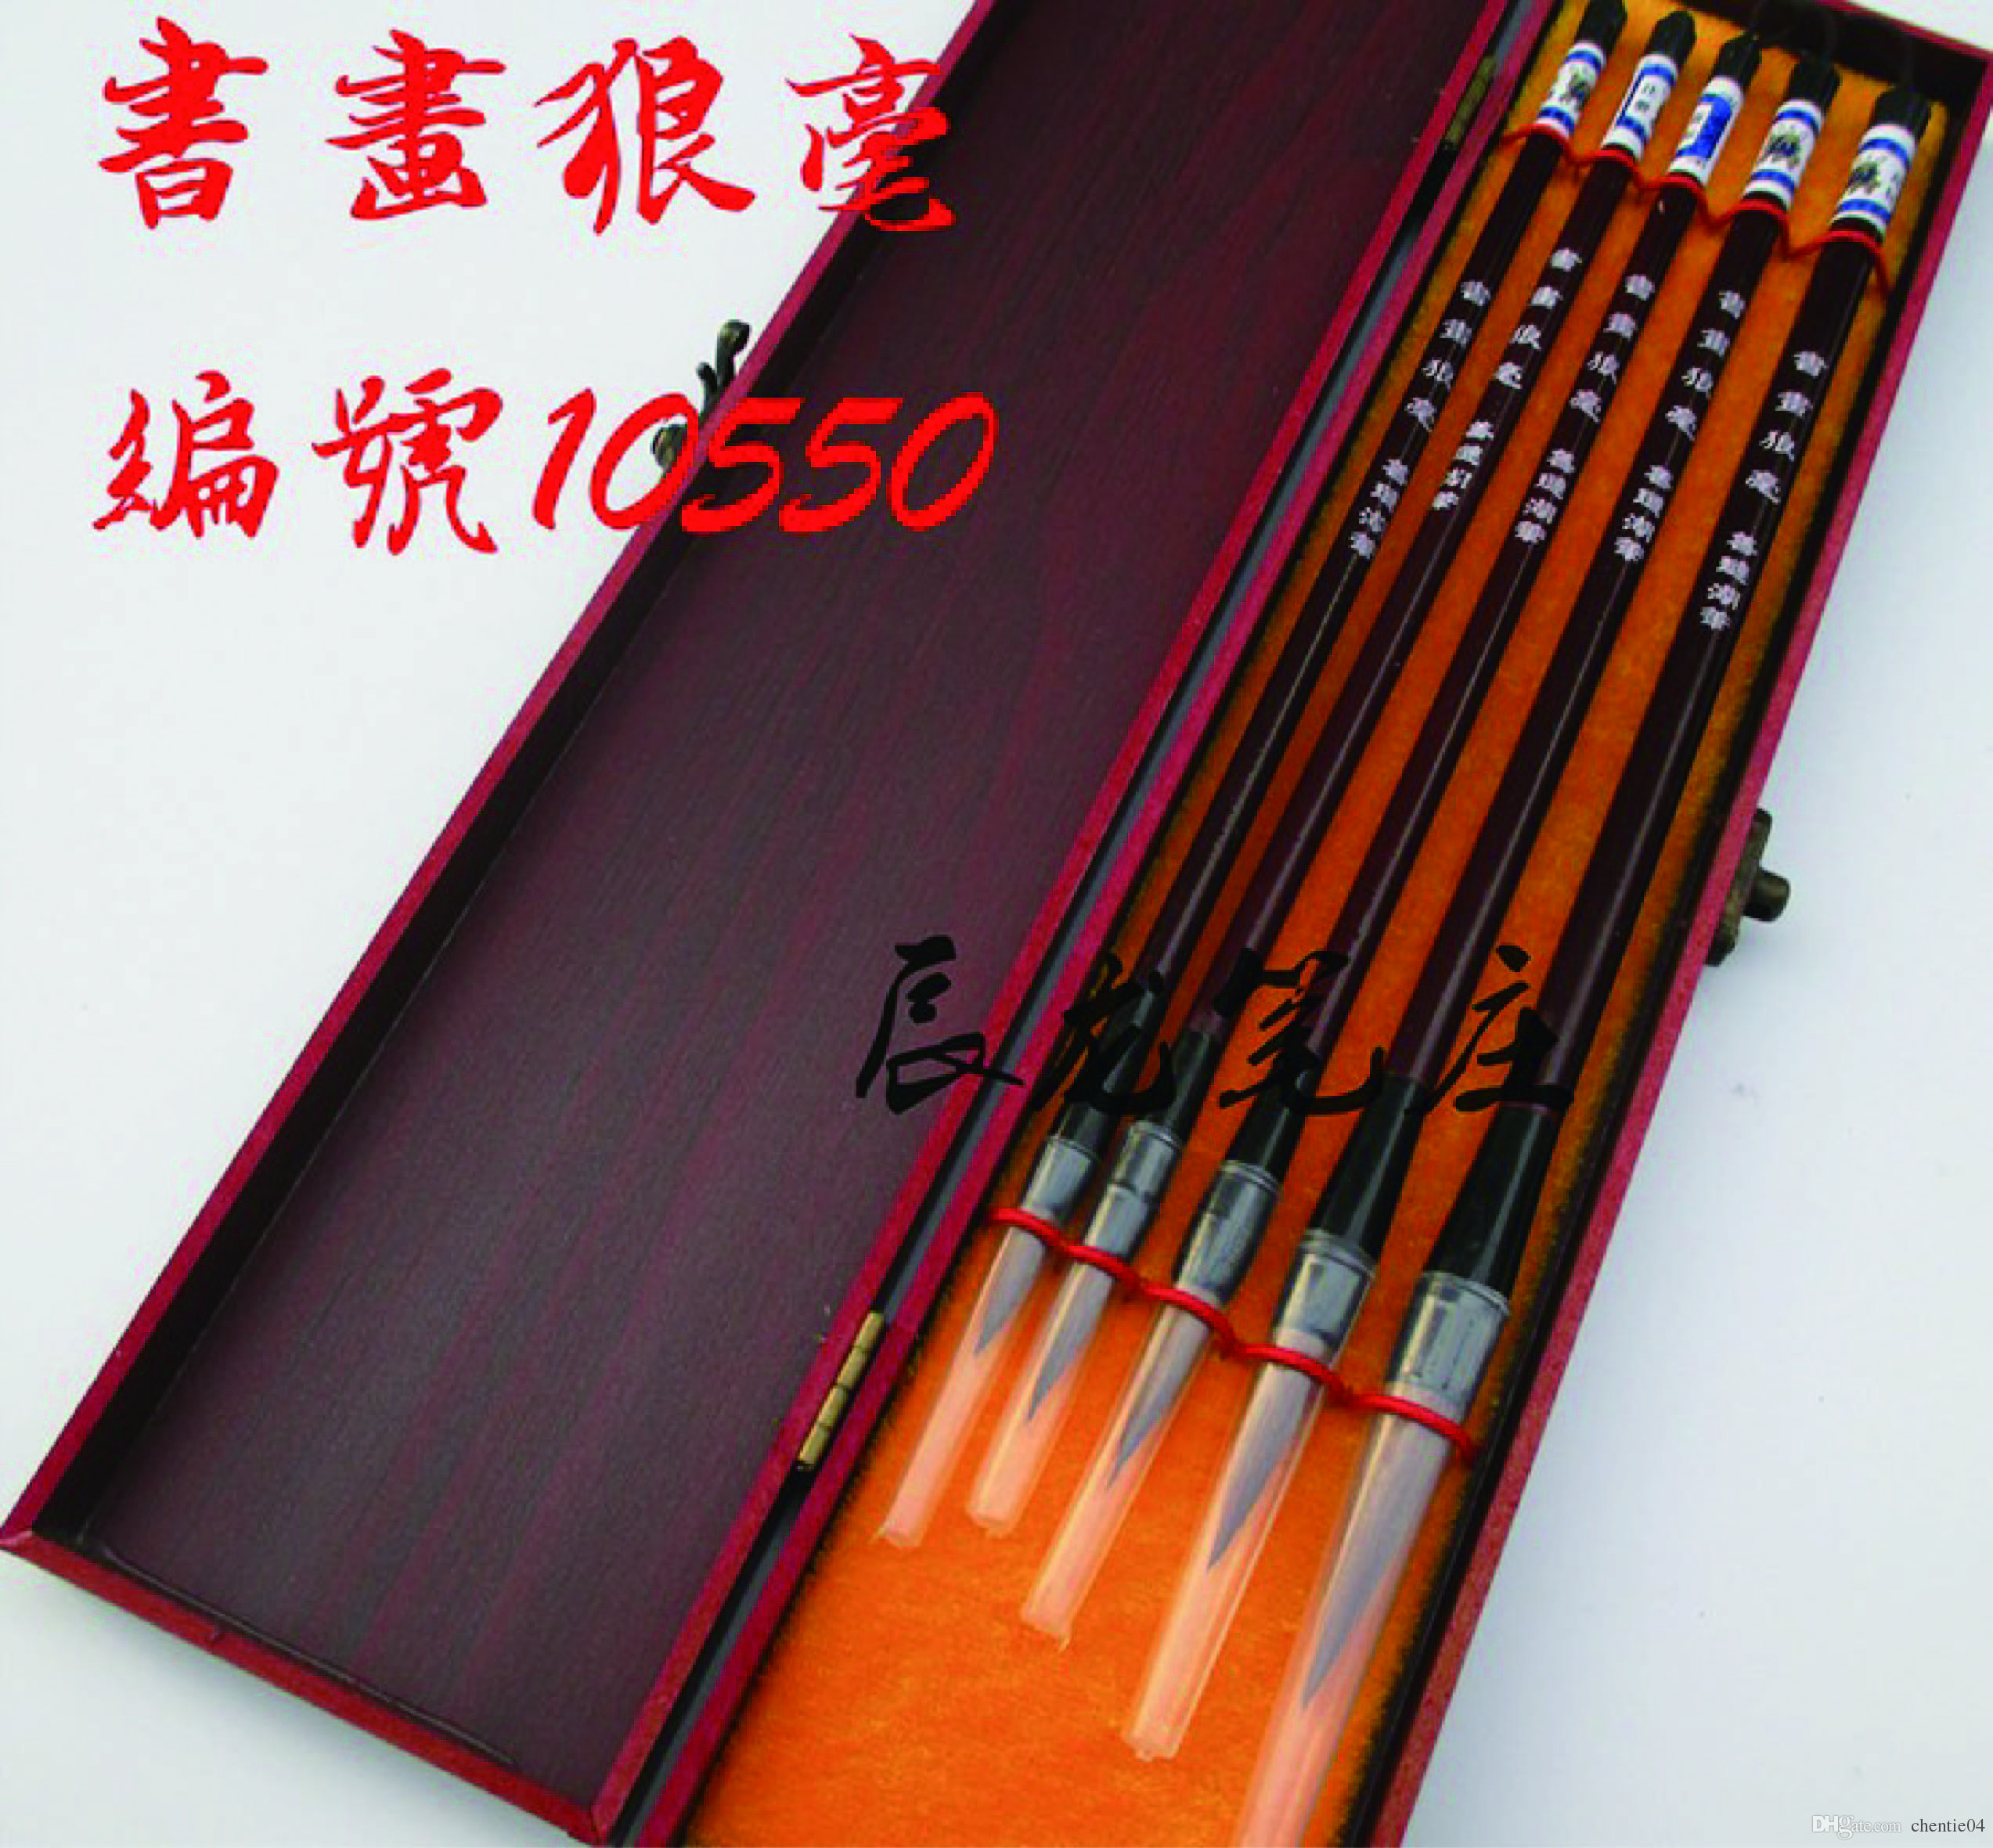 2017 Gift Set Chinese Calligraphy Brush Pen Calligraphy